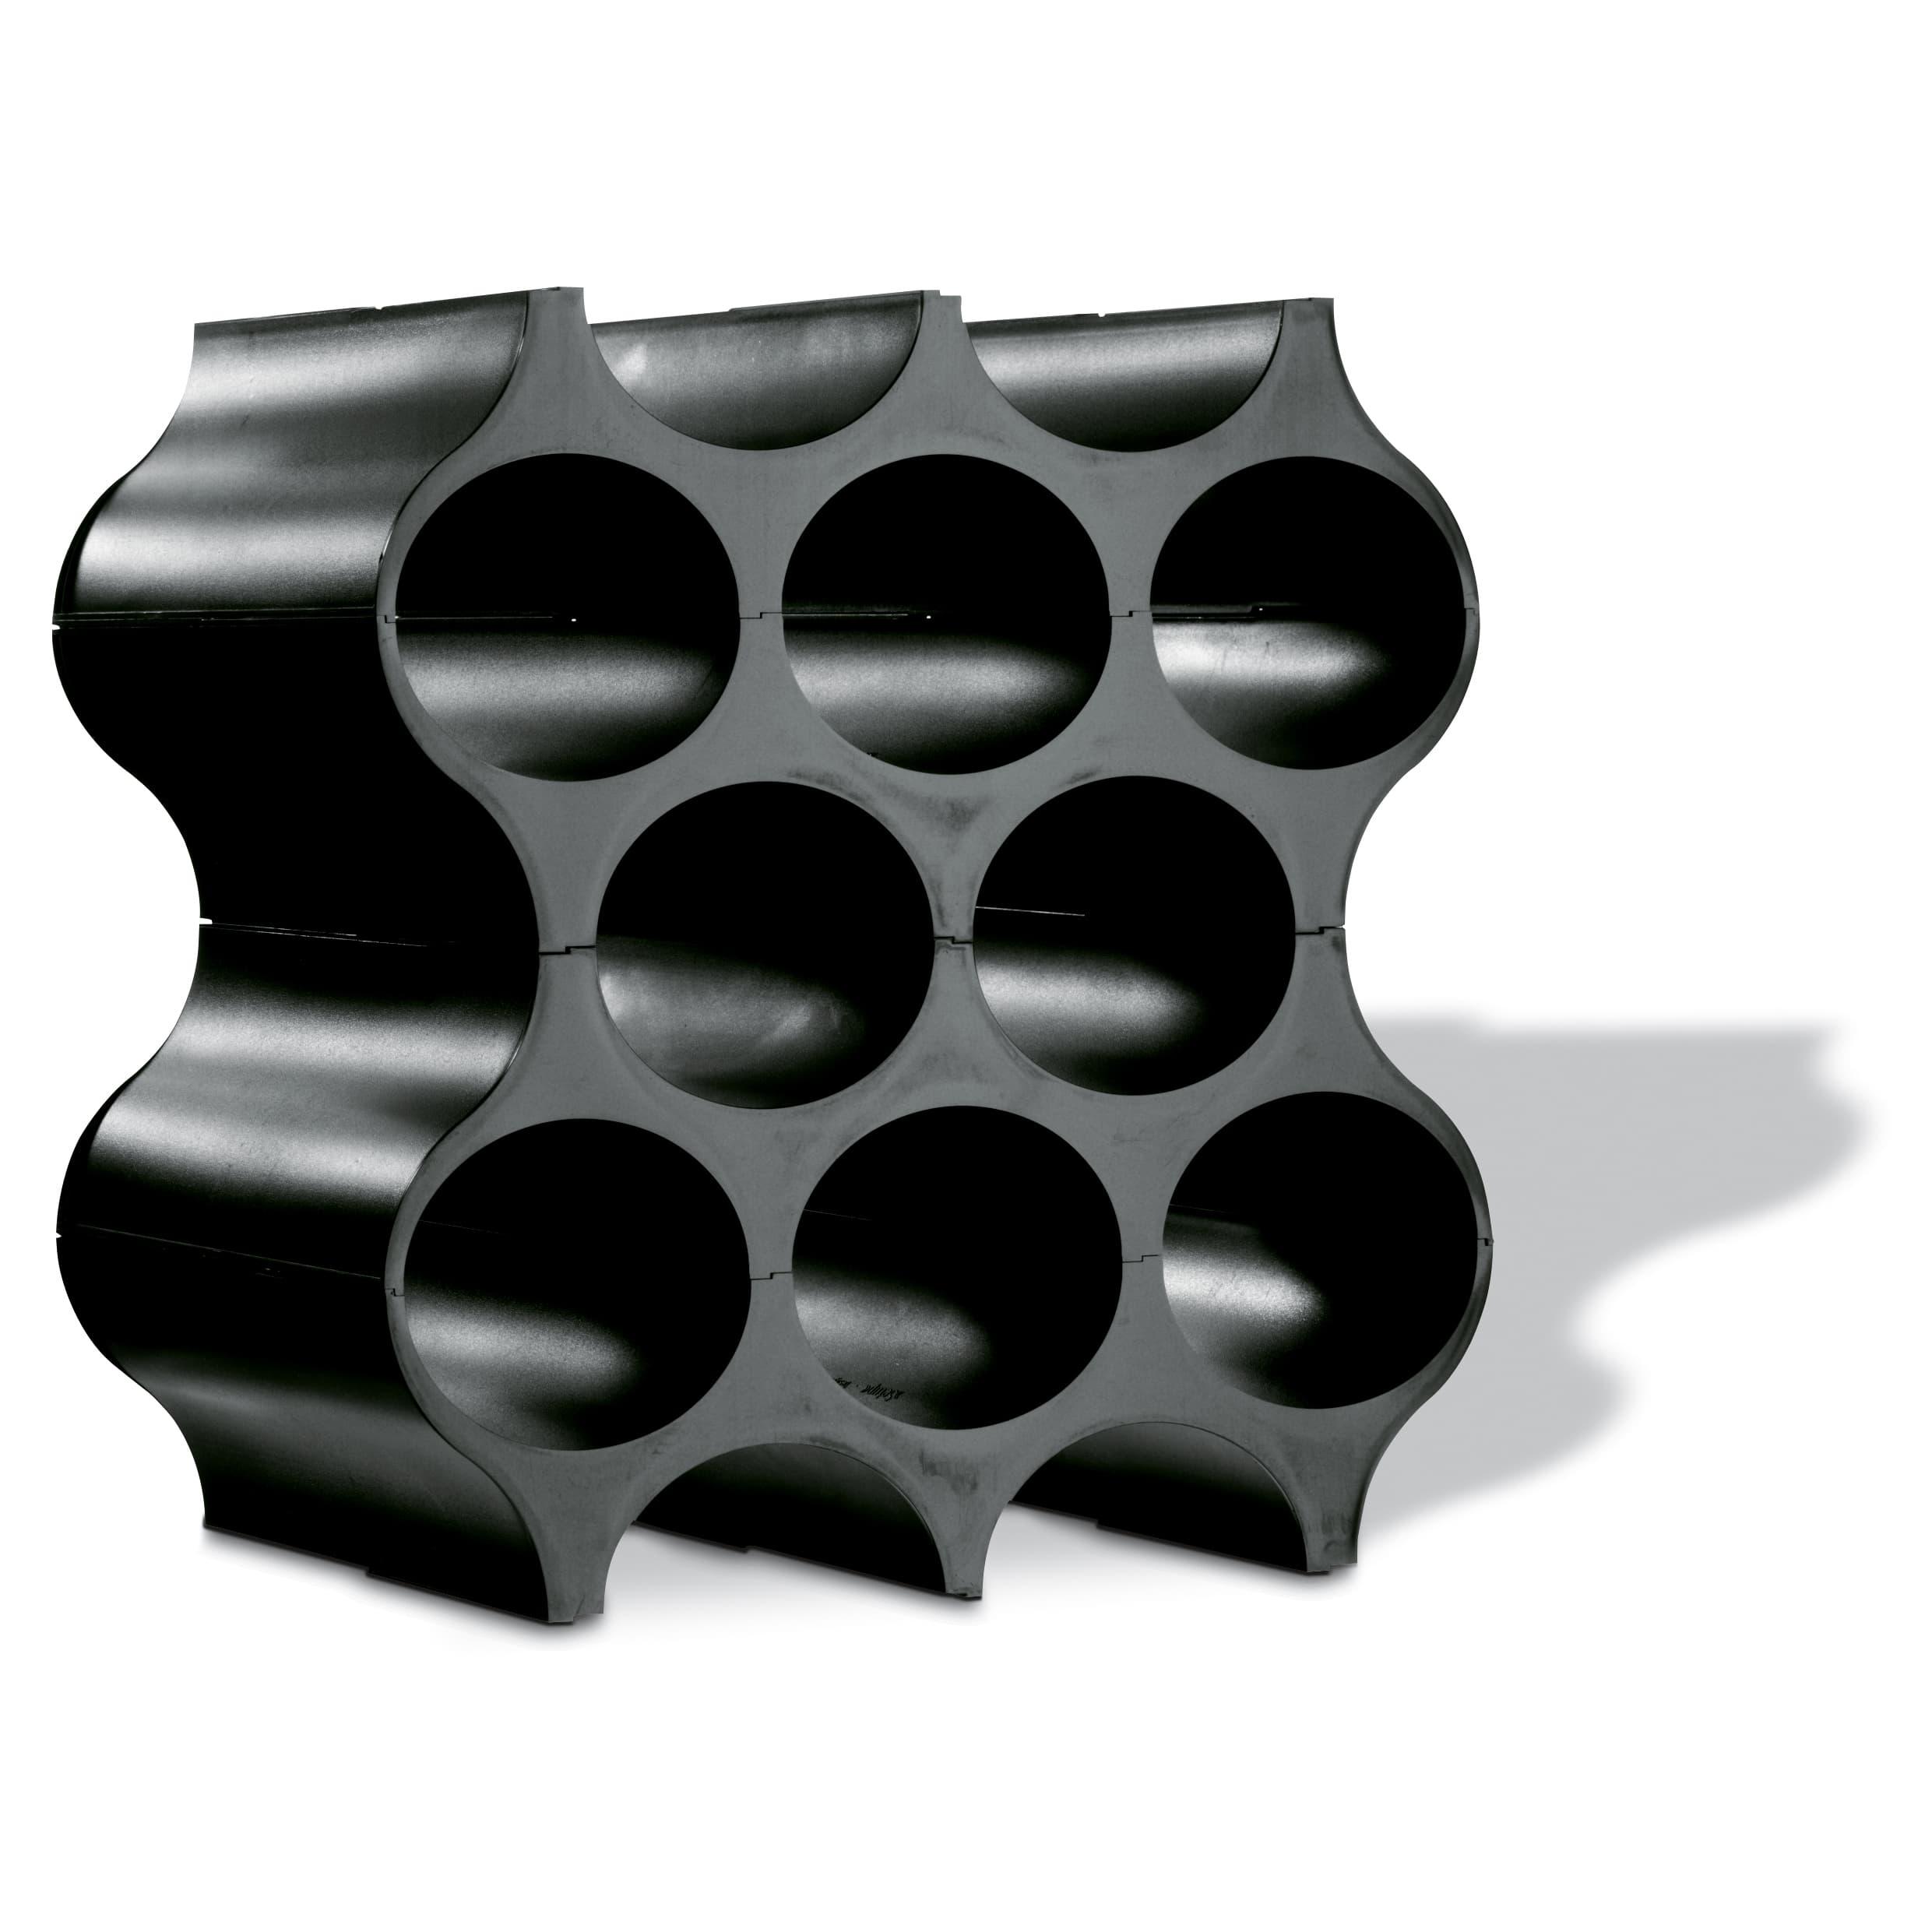 Suport din termoplastic pentru 10 sticle Set-Up Cosmos Negru, l23xA35,3xH36,4 cm